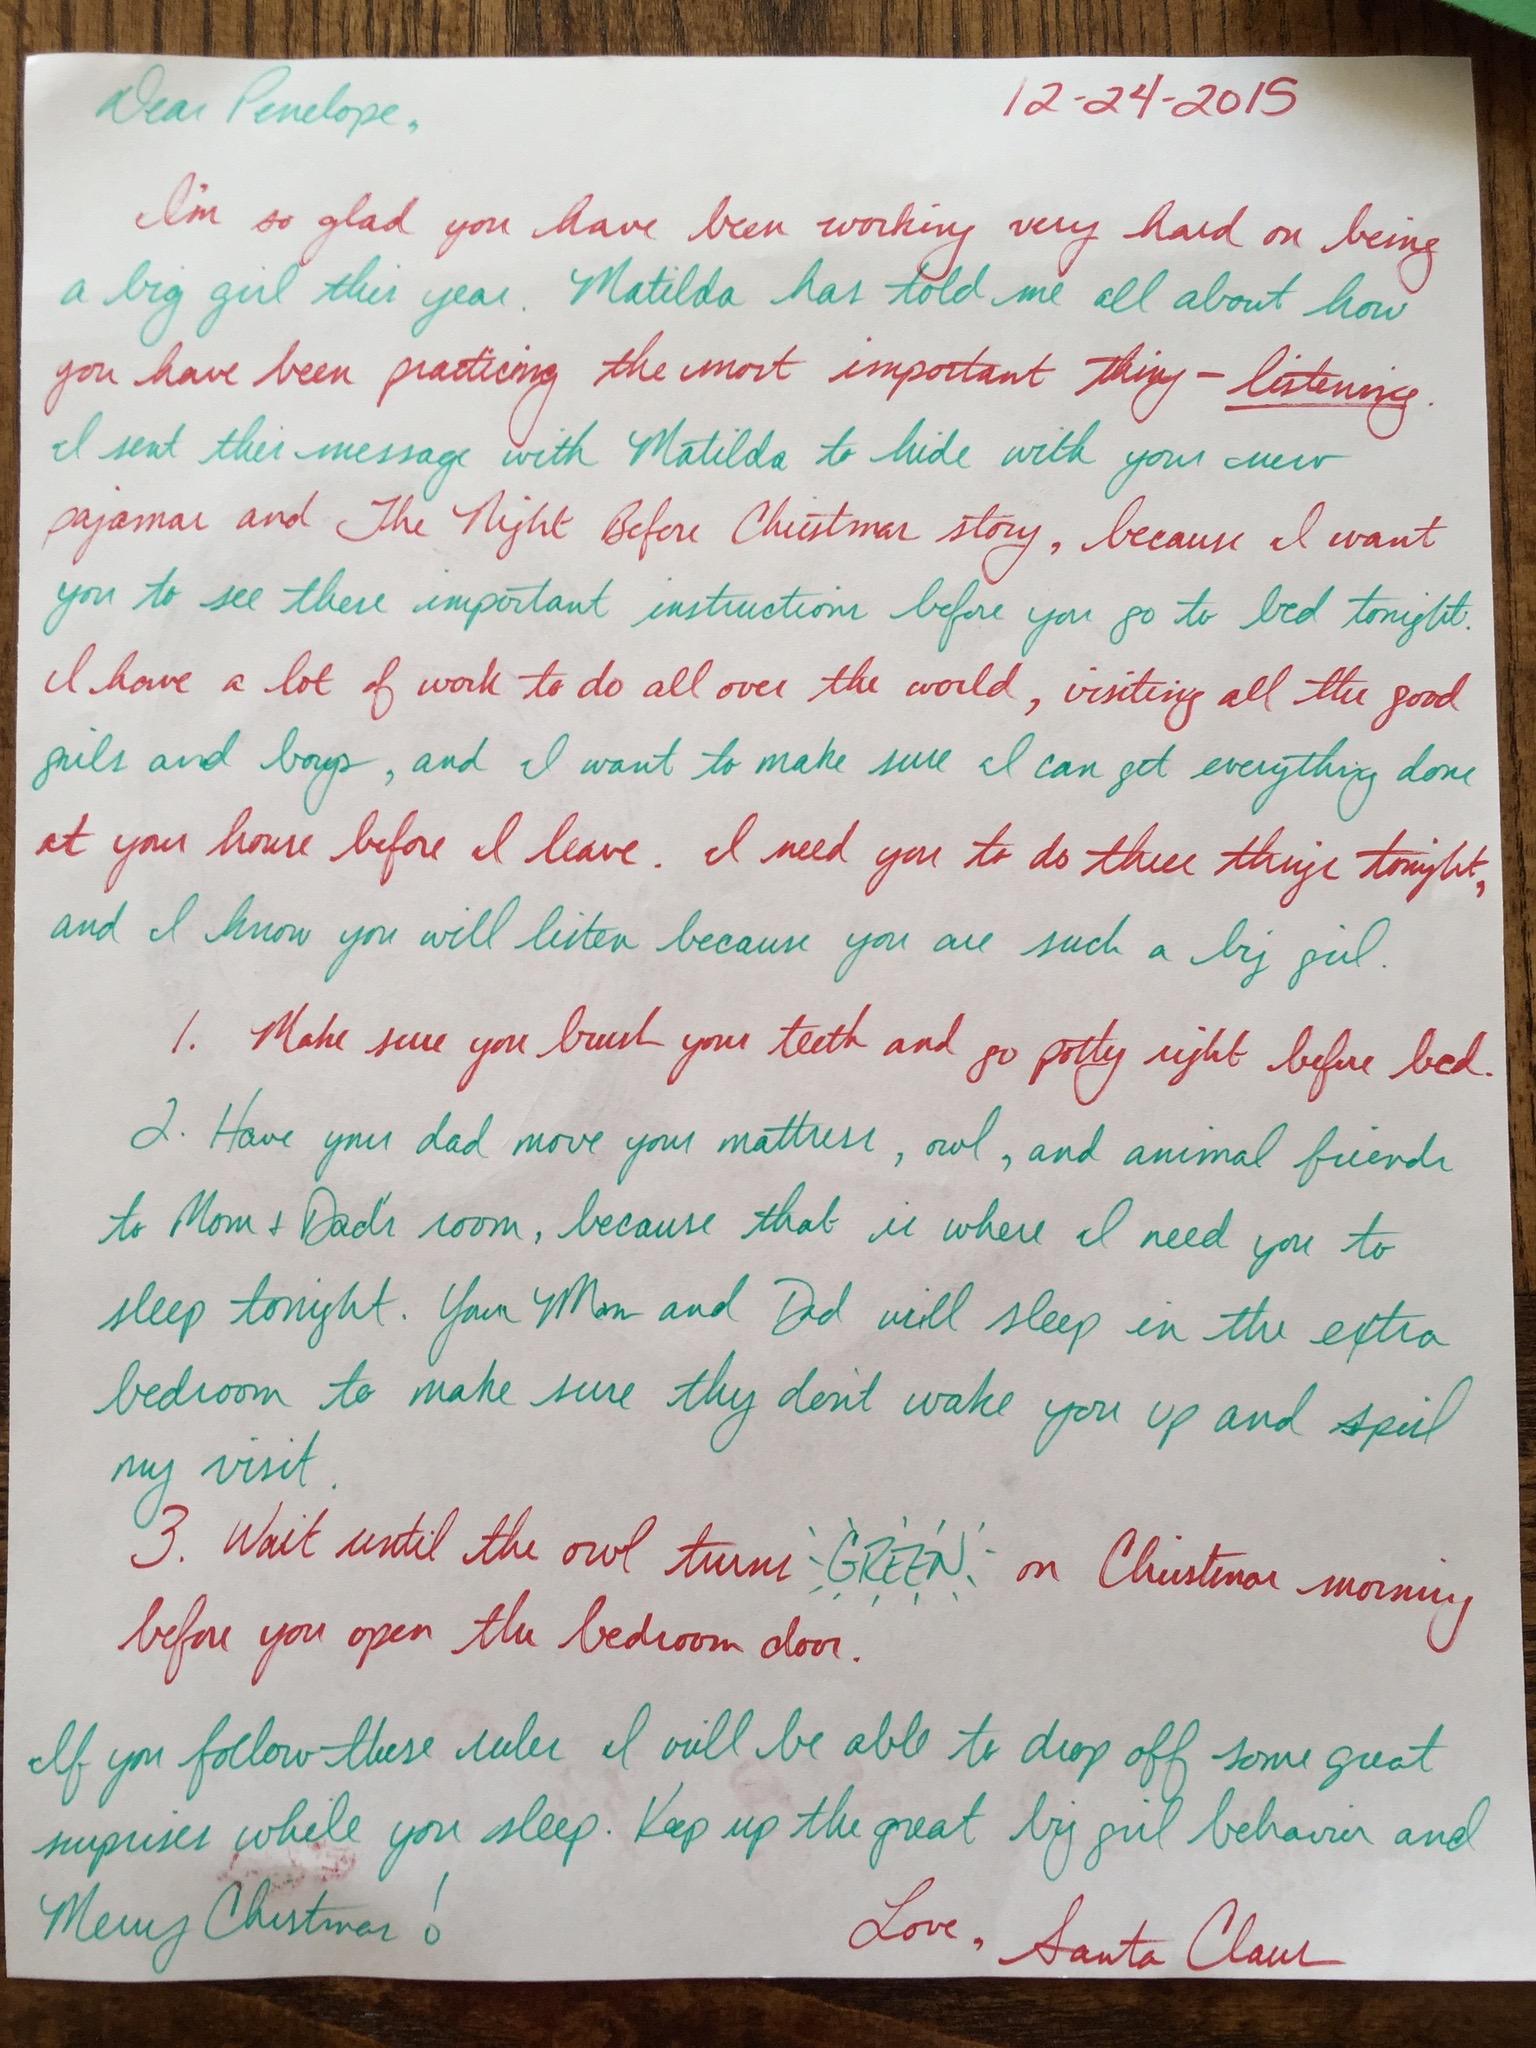 Santa's Christmas Eve instructions for Penelope